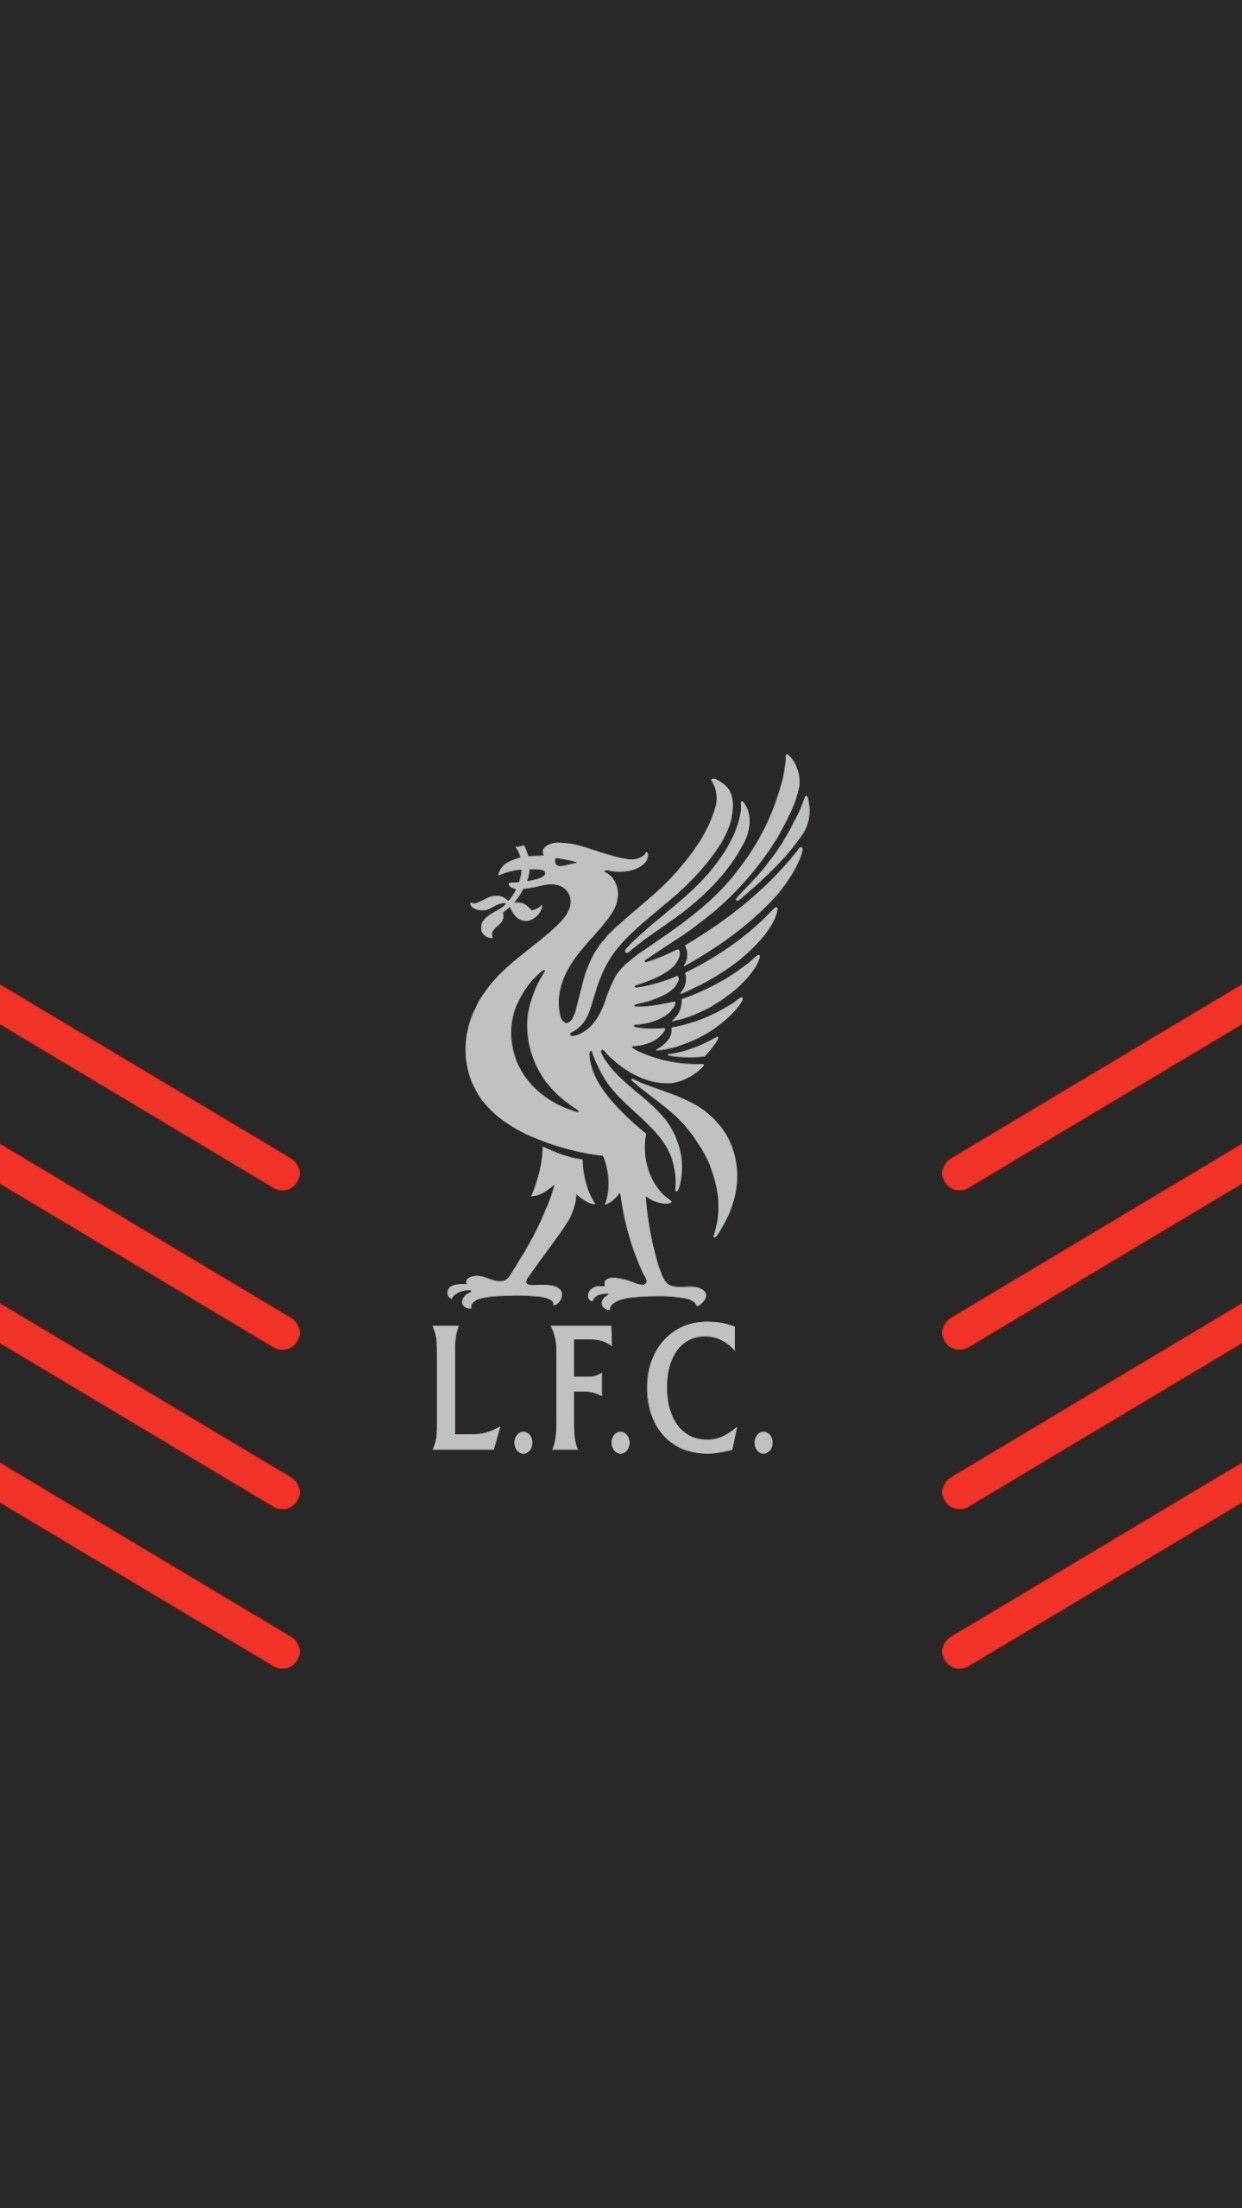 Wallpaper iphone liverpool - Liverpool Wallpaper Iphone